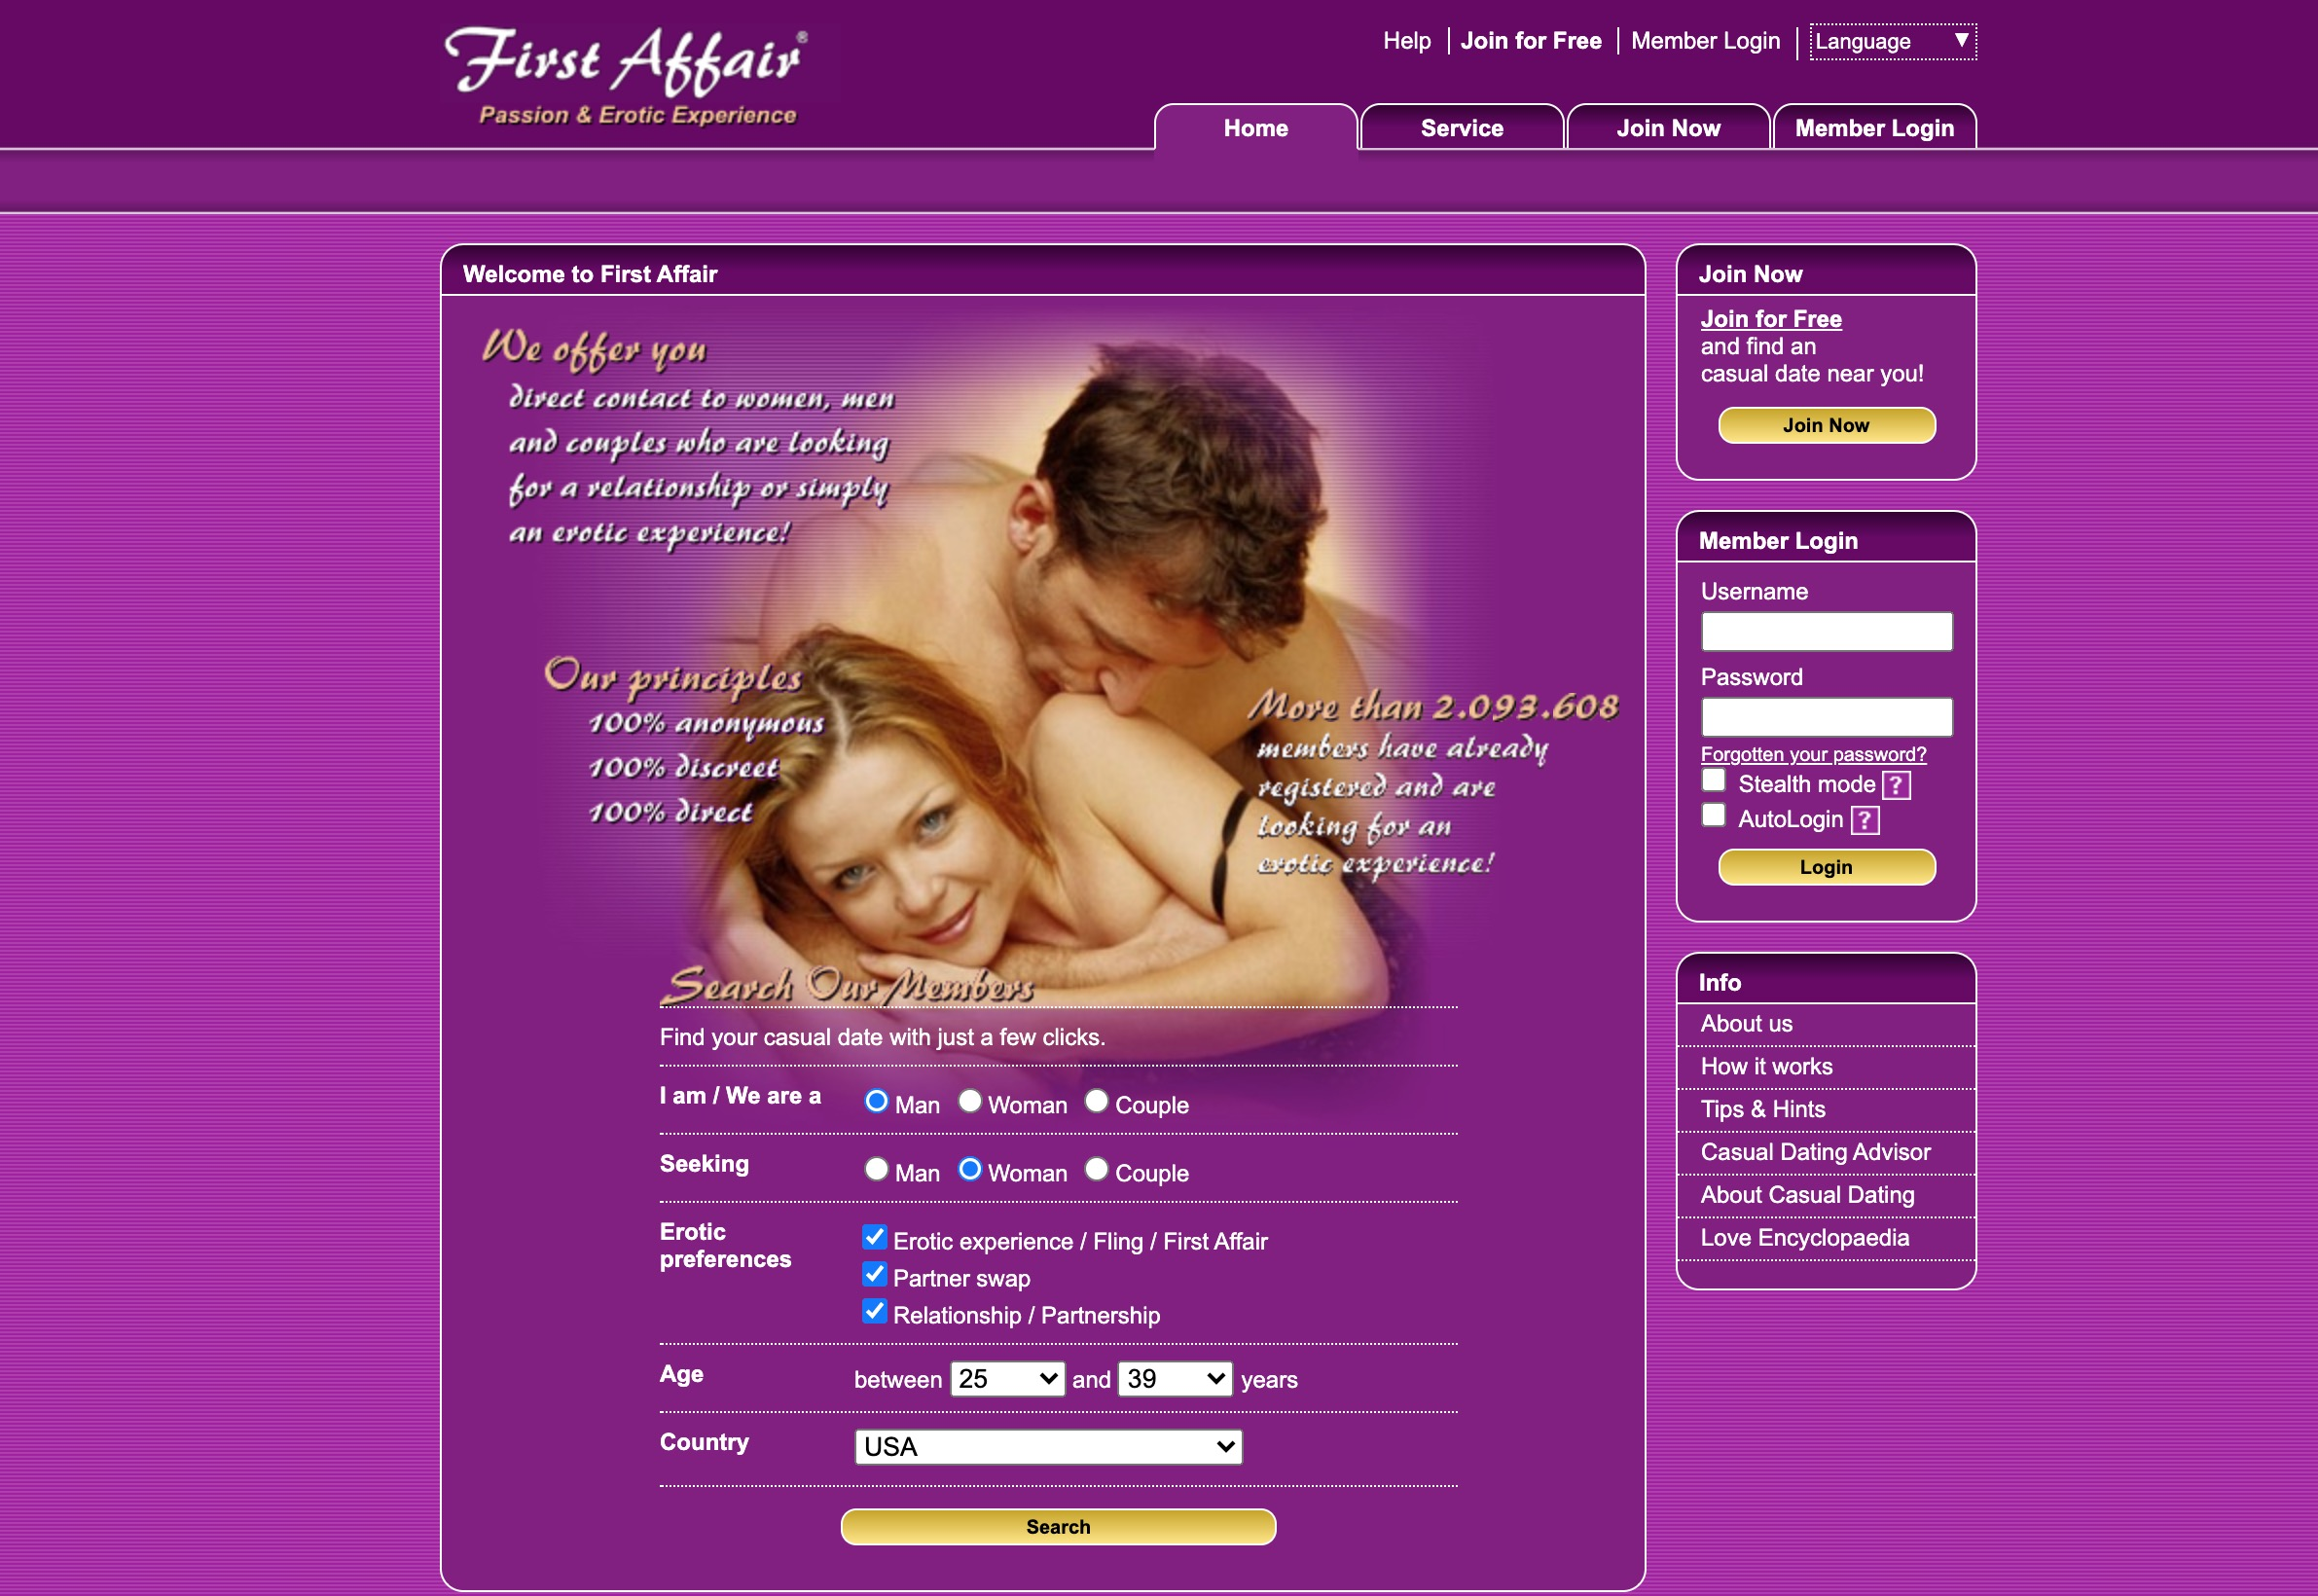 FirstAffair main page